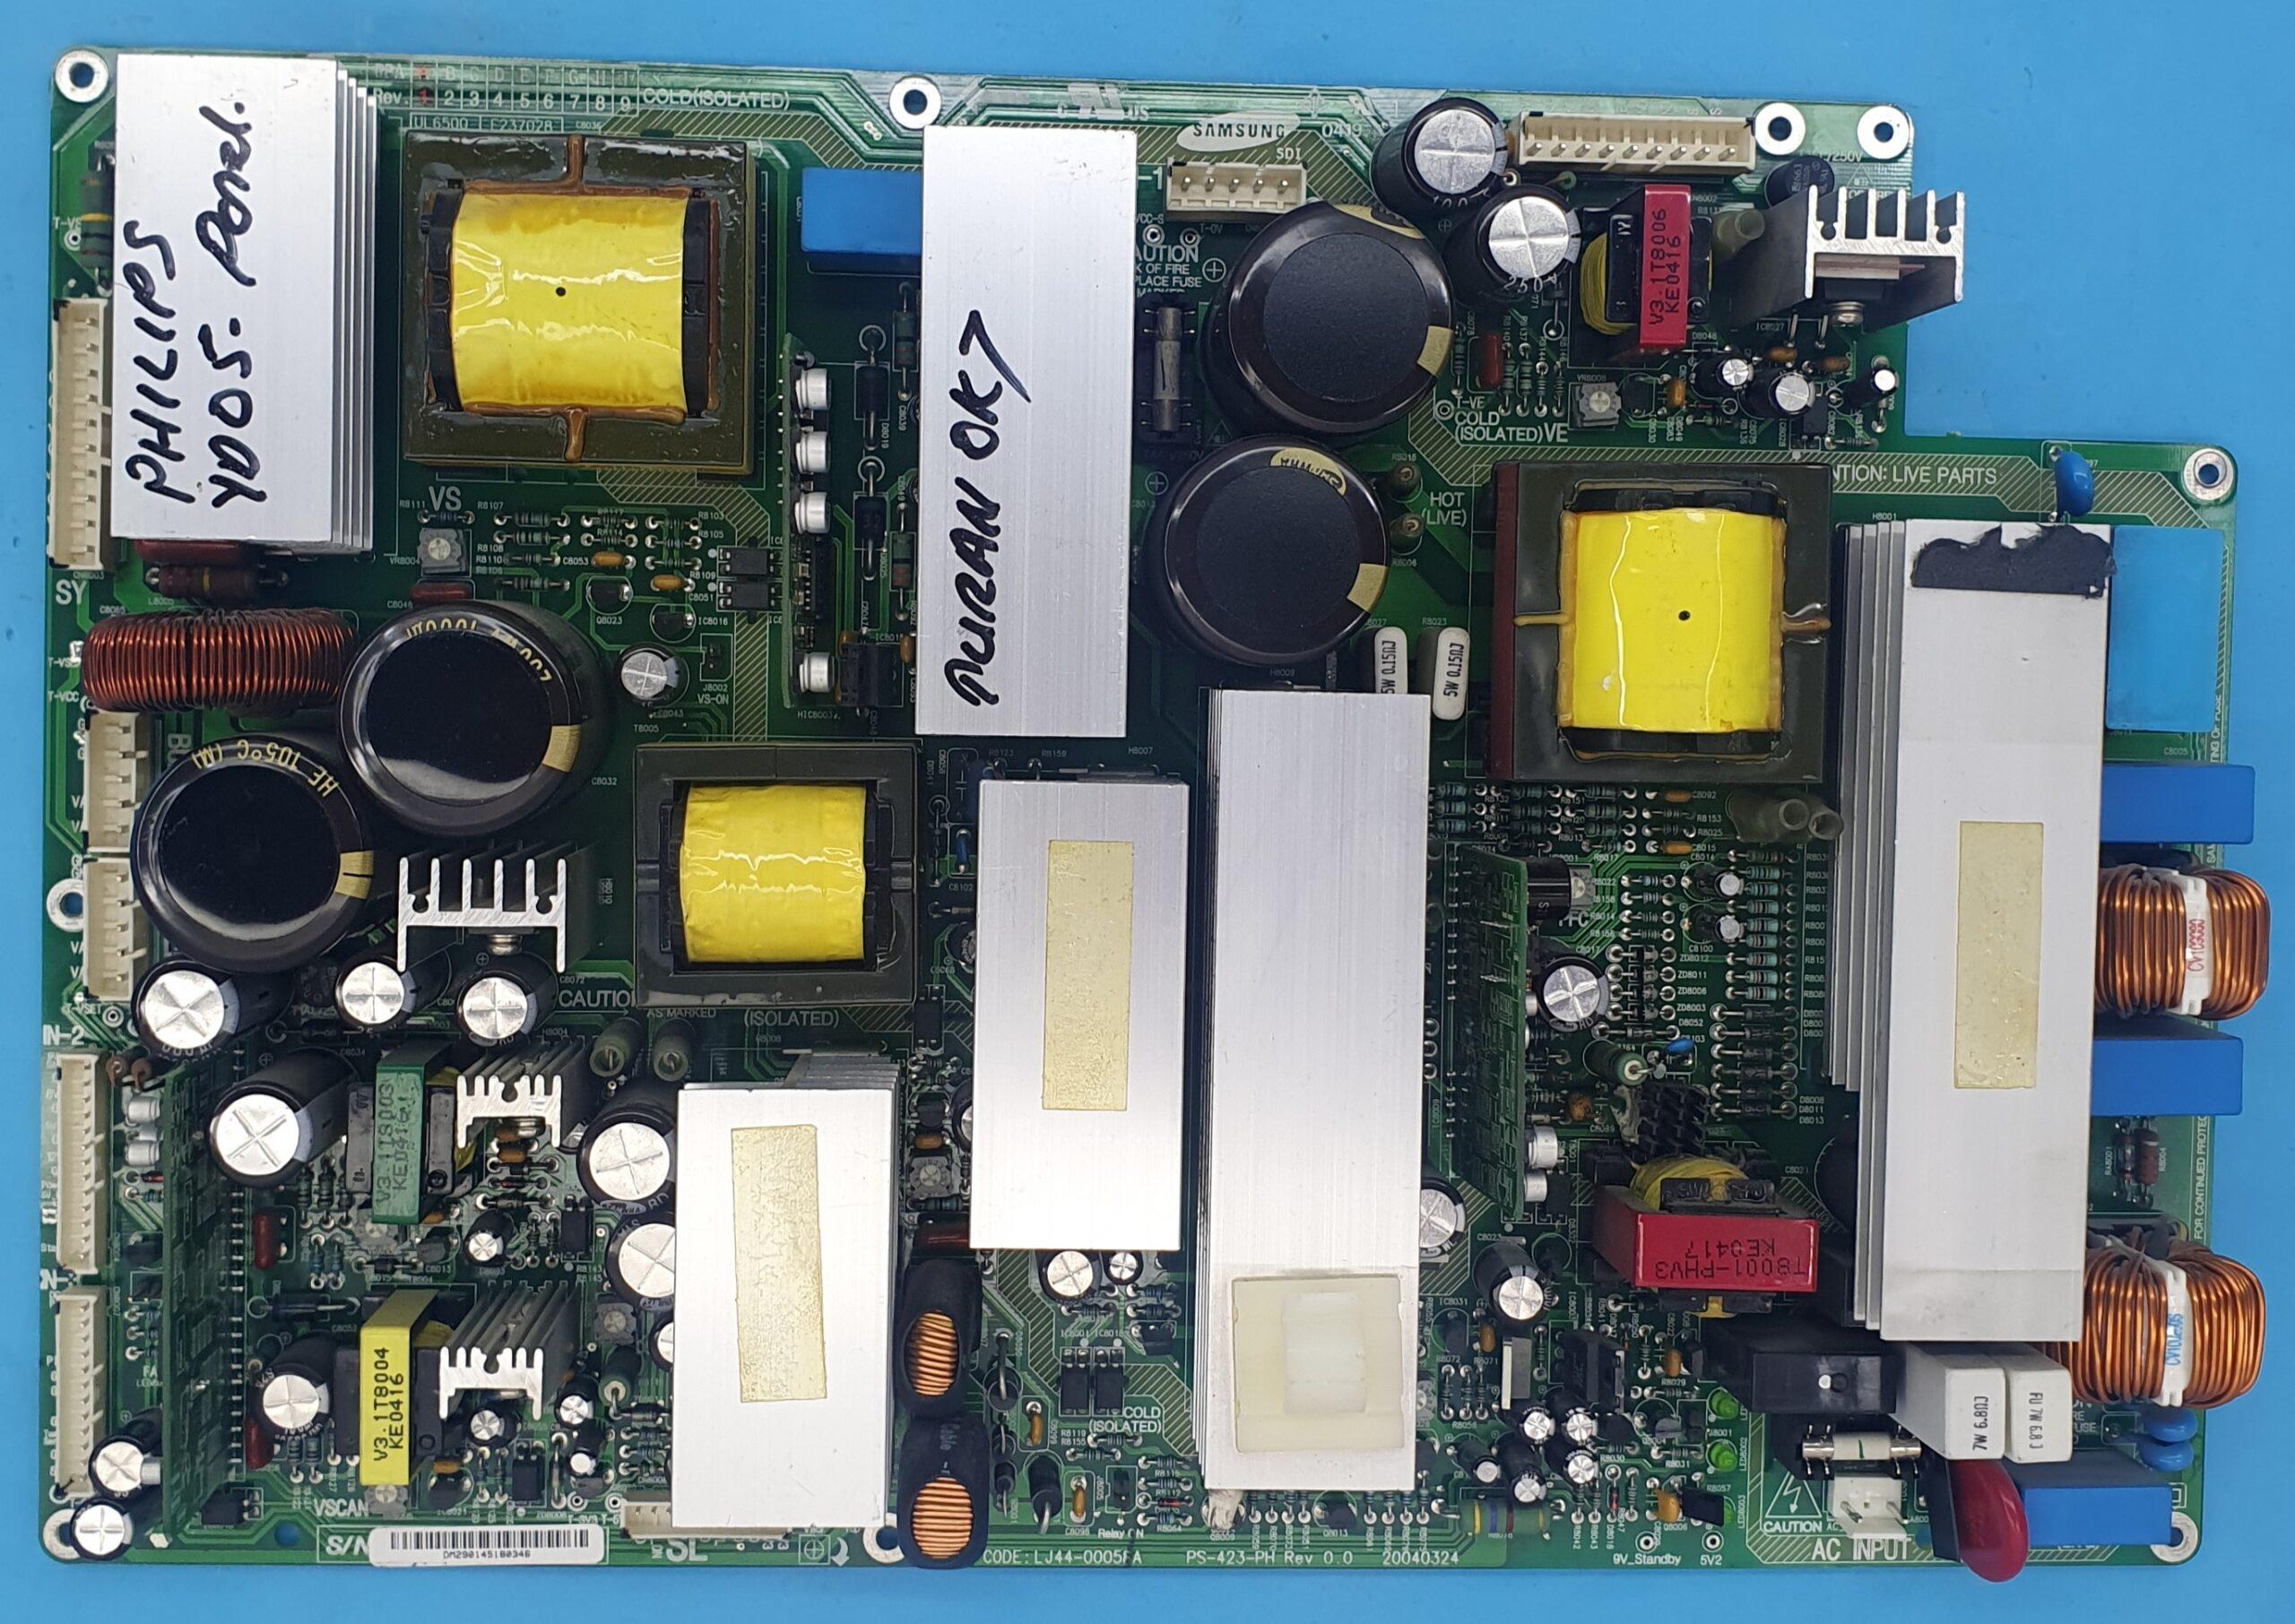 PS-423-PH Philips Power (KDV DAHİL = 180 TL)